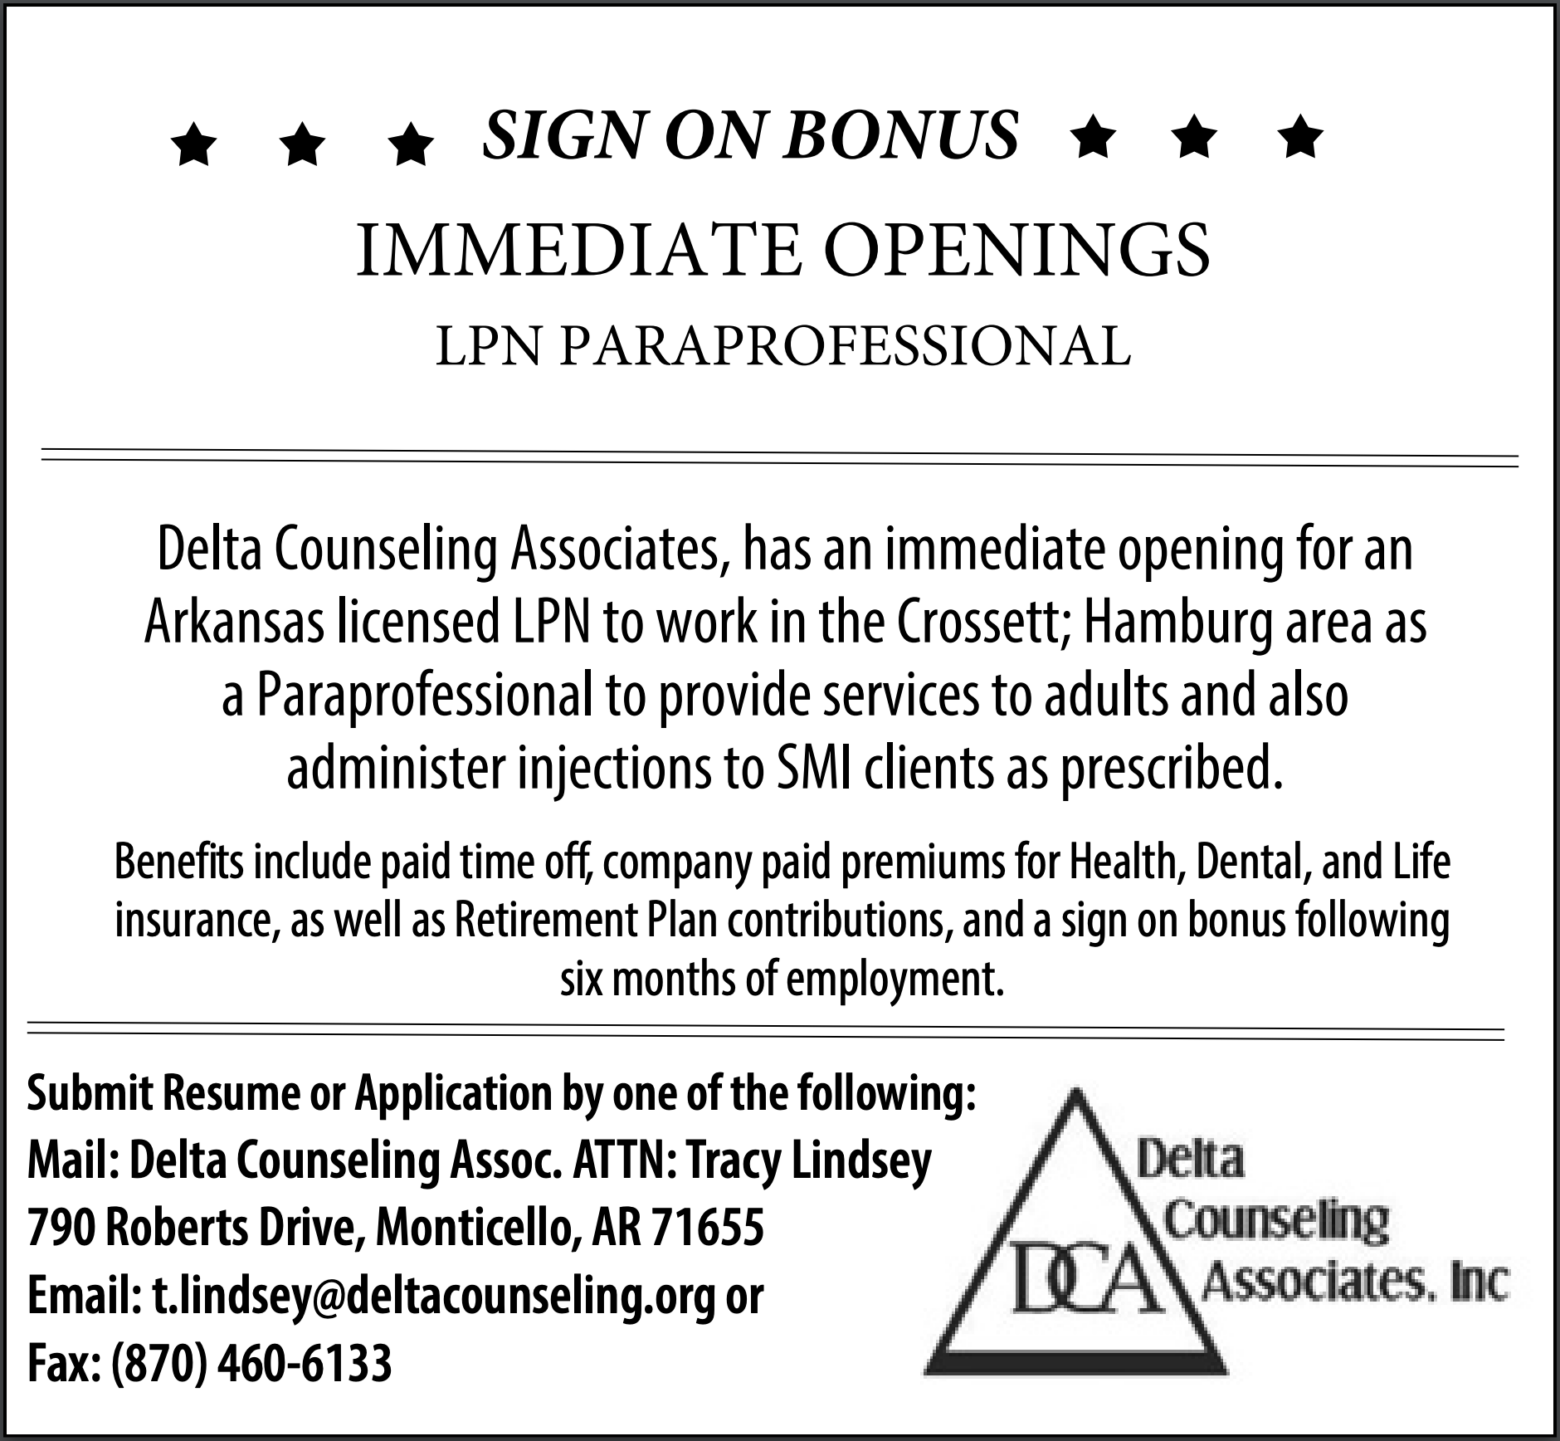 Sign On Bonus-Immediate Openings-LPN Paraprofessional